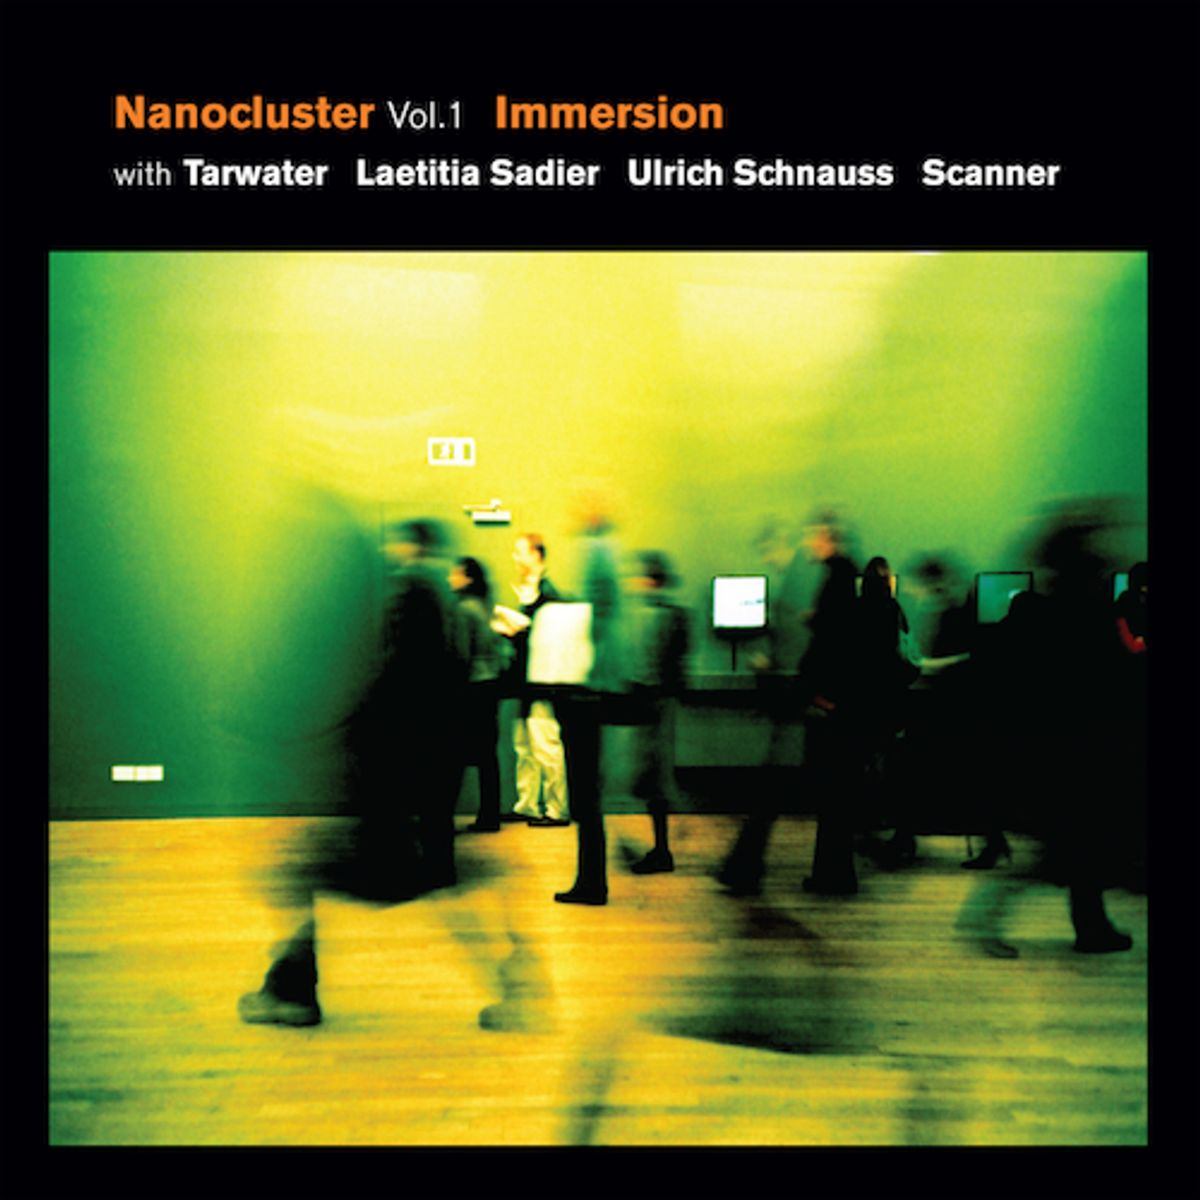 Nanocluster Vol. 1